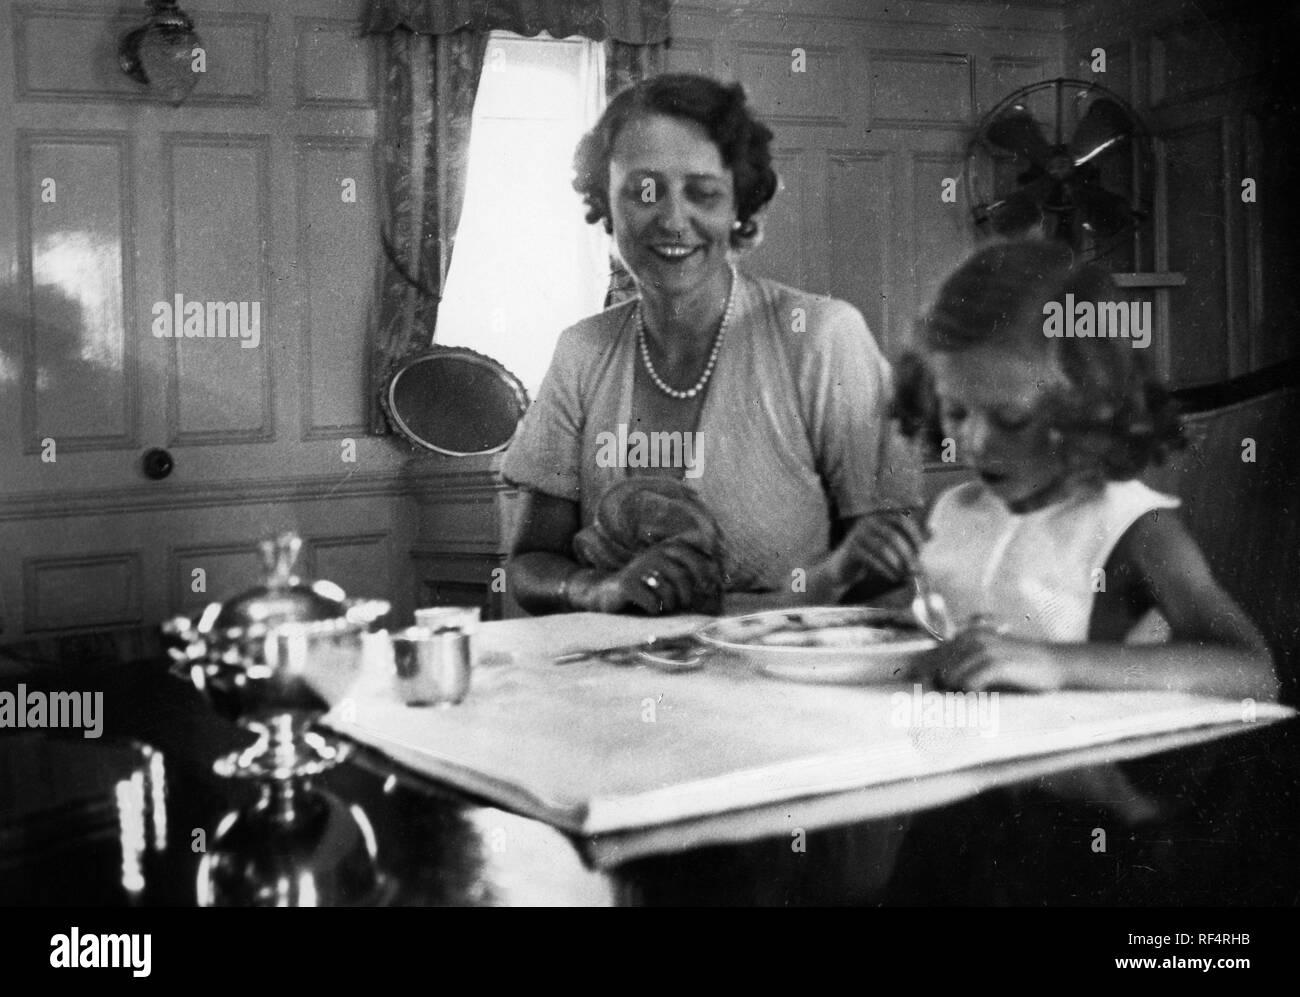 Elettra Marconi et maman, 1936 Banque D'Images